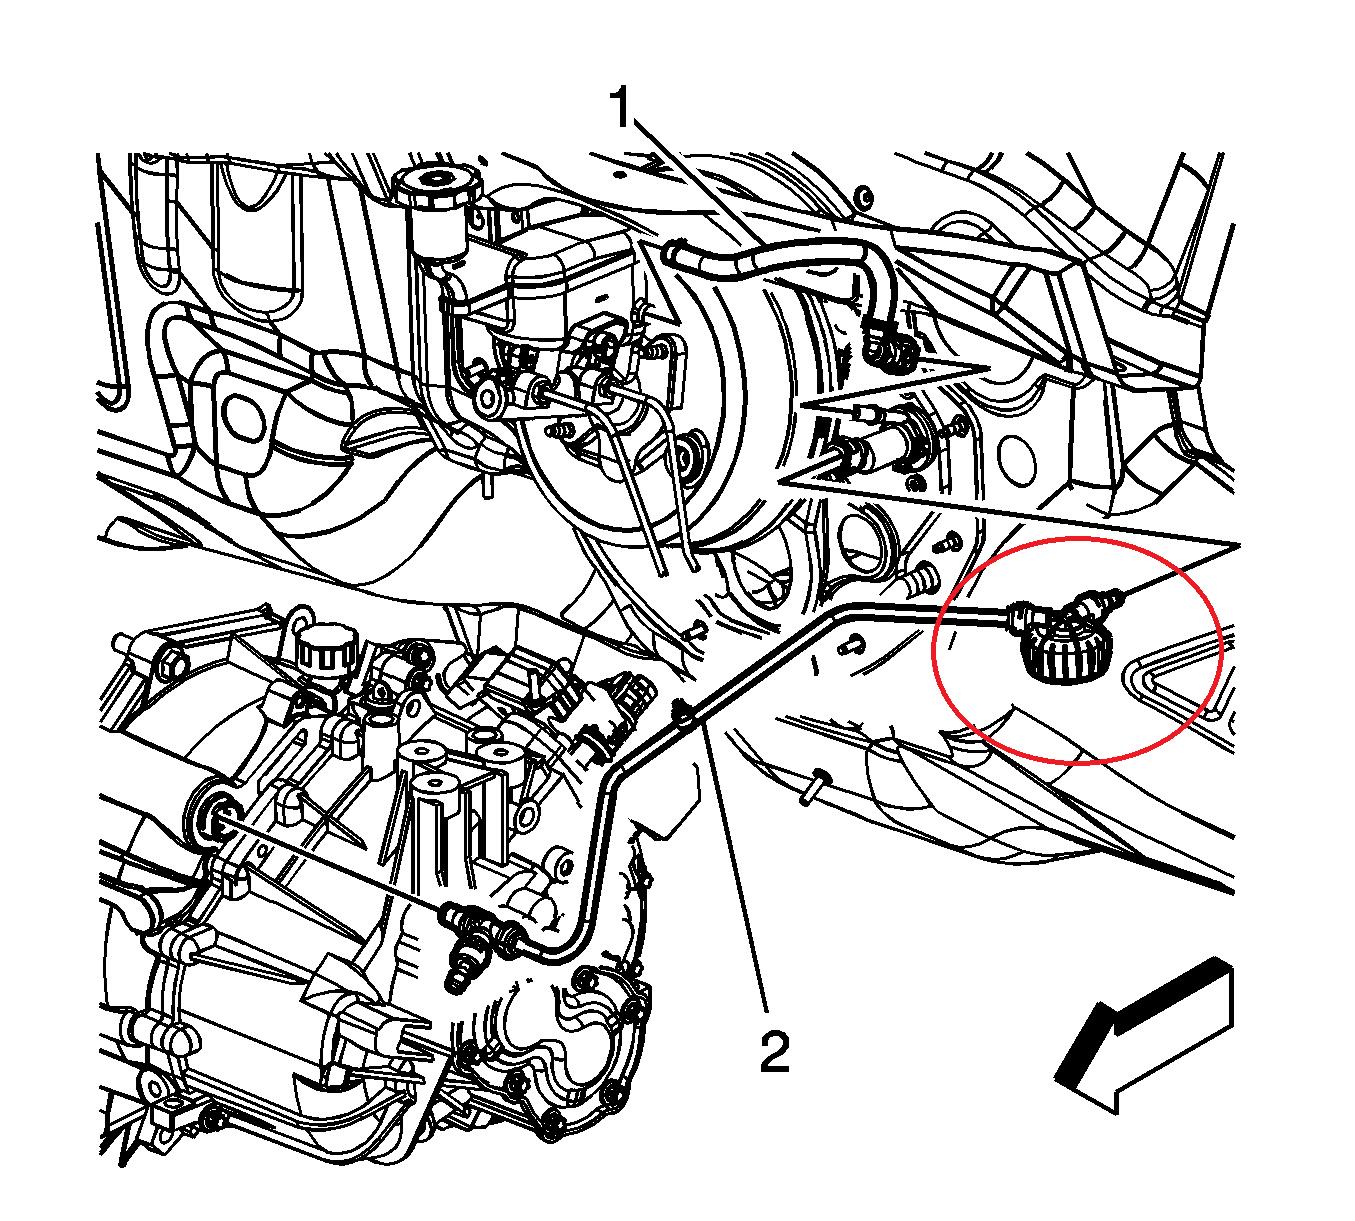 High Pressure In Clutch Pedal During 3 4 Shift